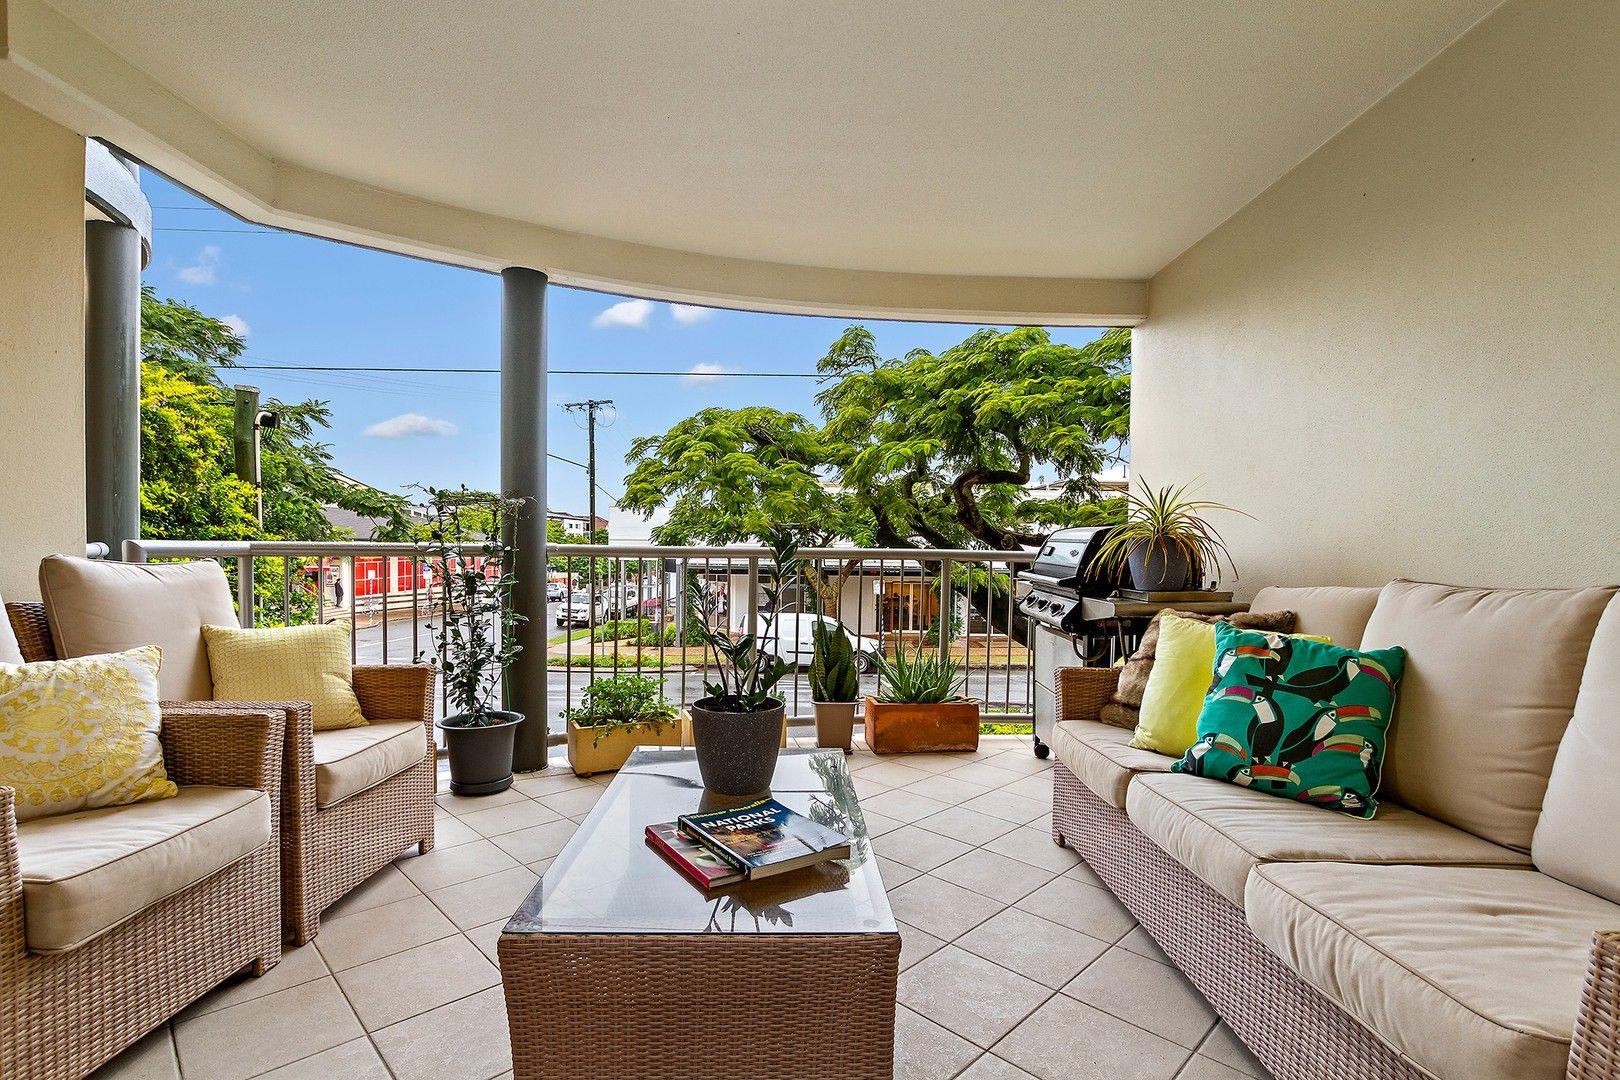 3 bedrooms Apartment / Unit / Flat in 102 Racecourse Road ASCOT QLD, 4007